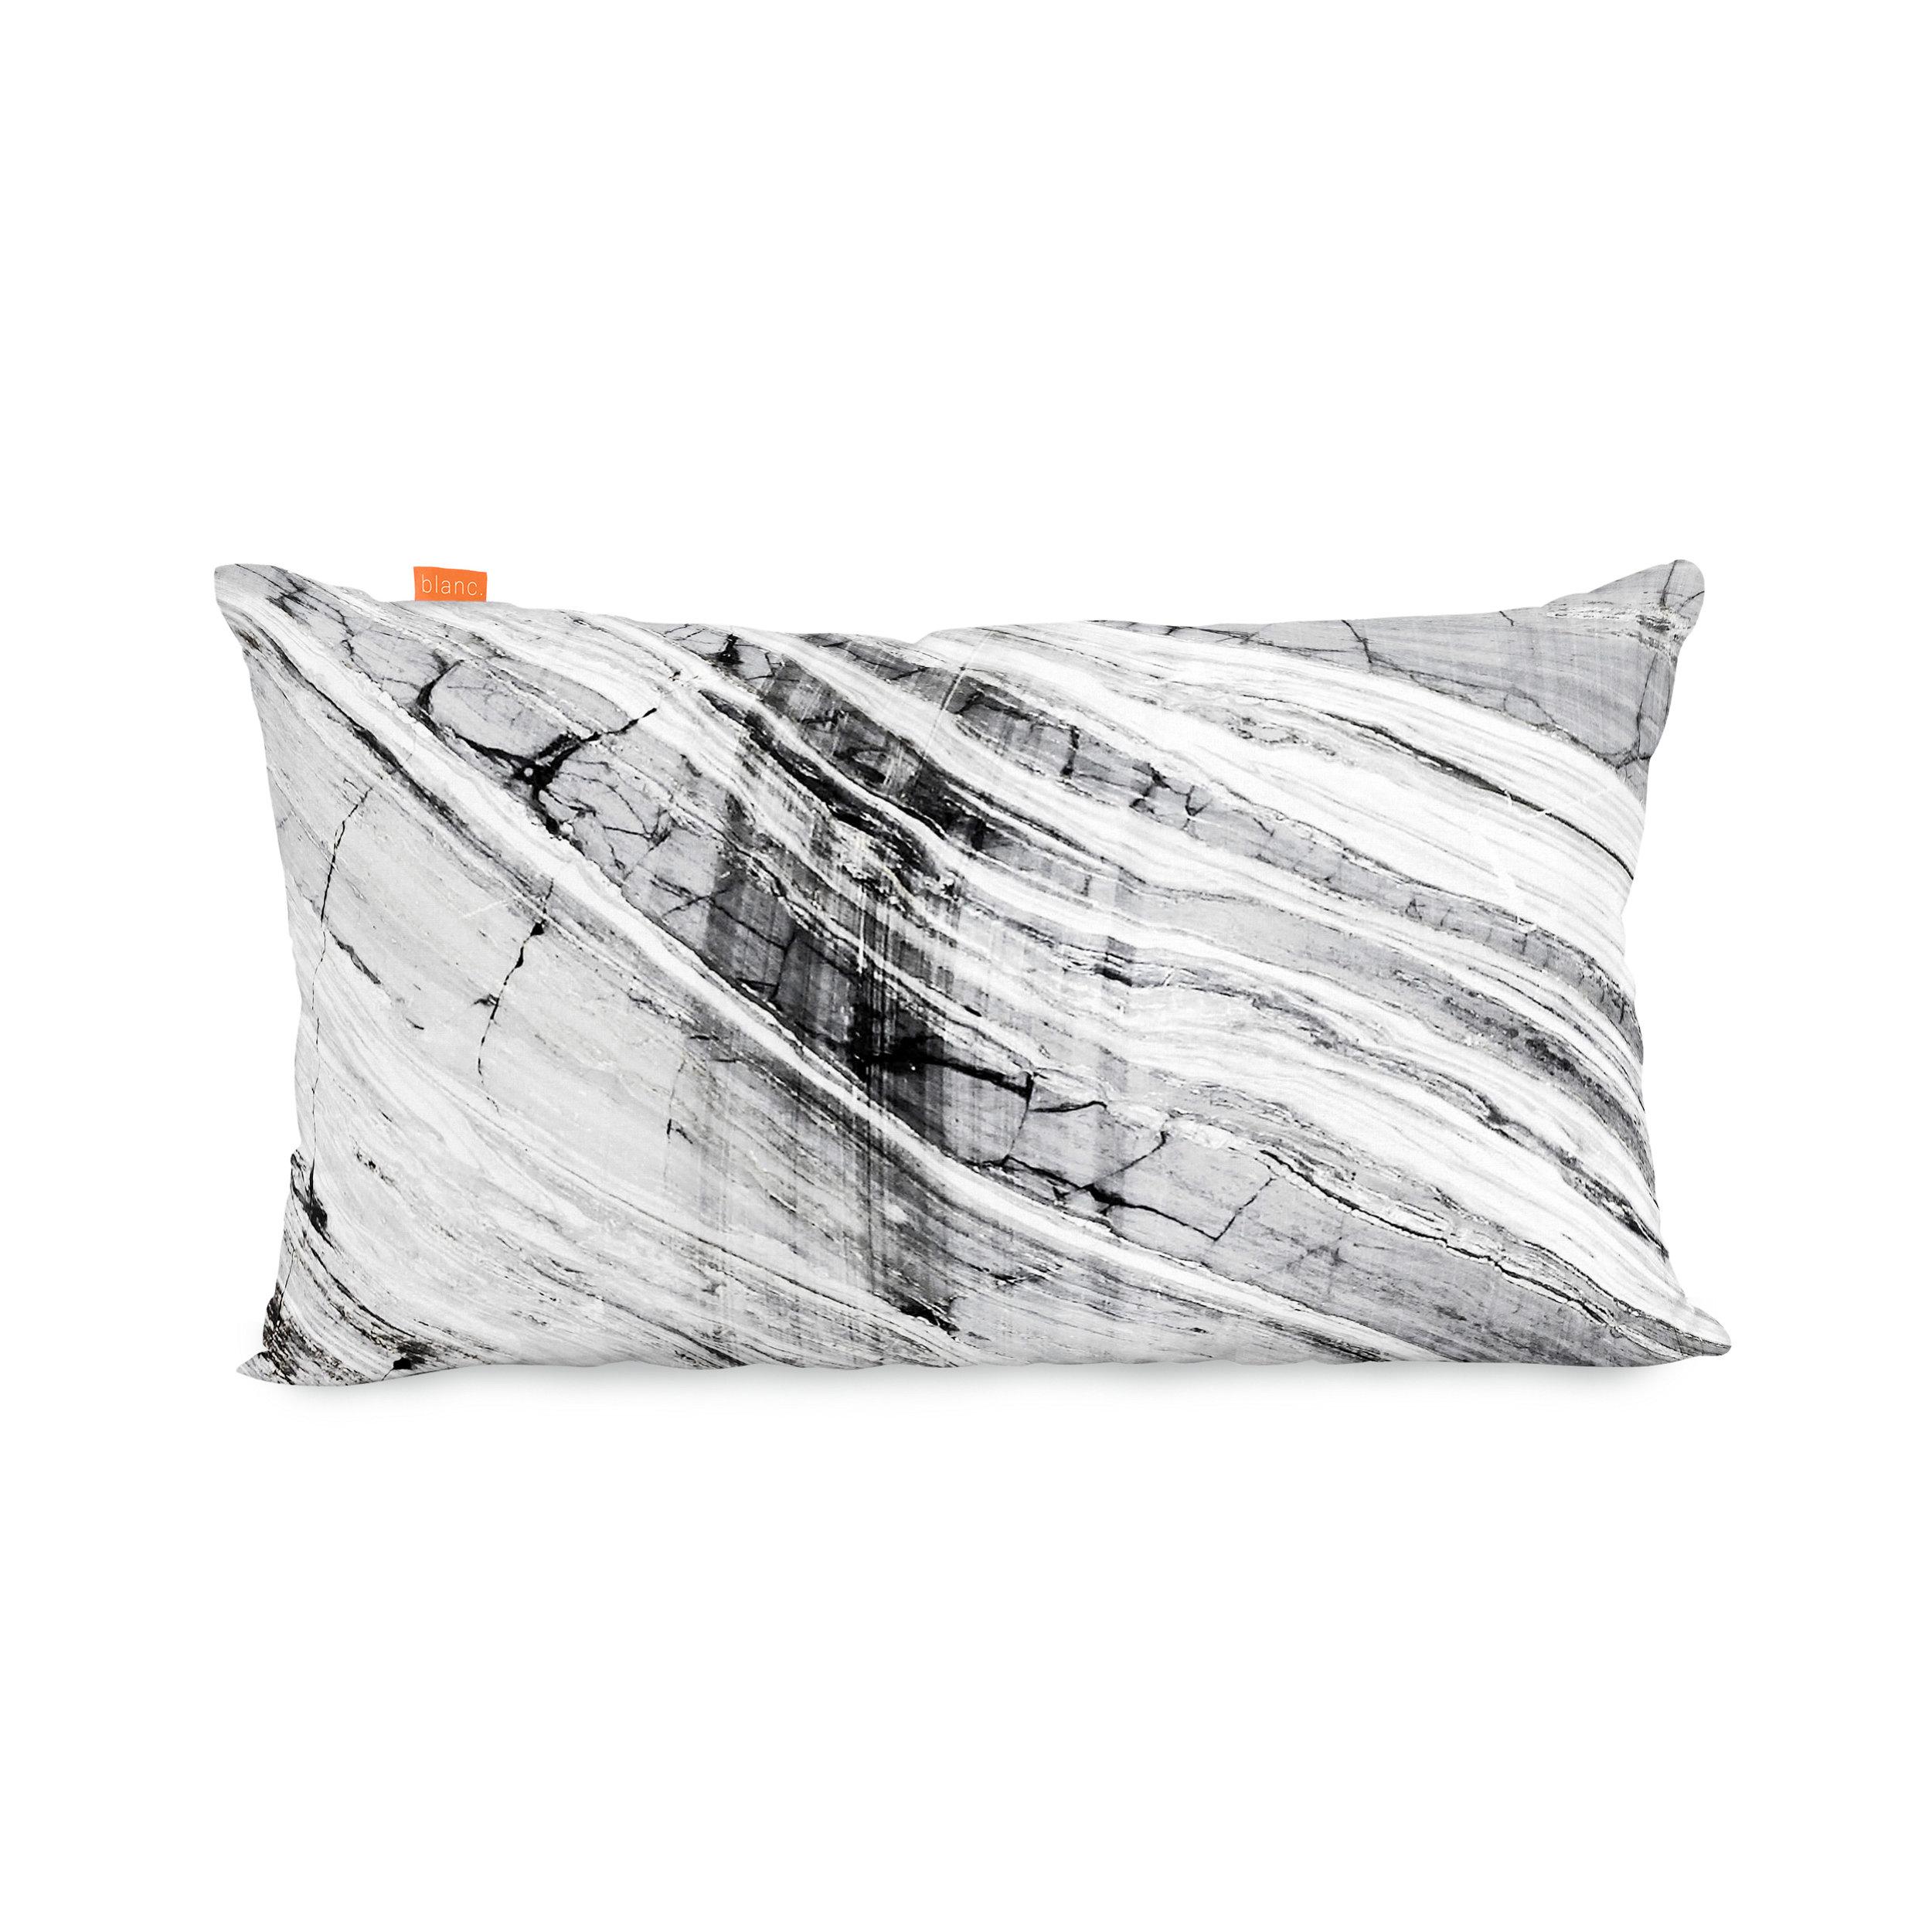 30003787_02_Blanc-Essence-Marble-Oblong-Cushion-Cover.jpg